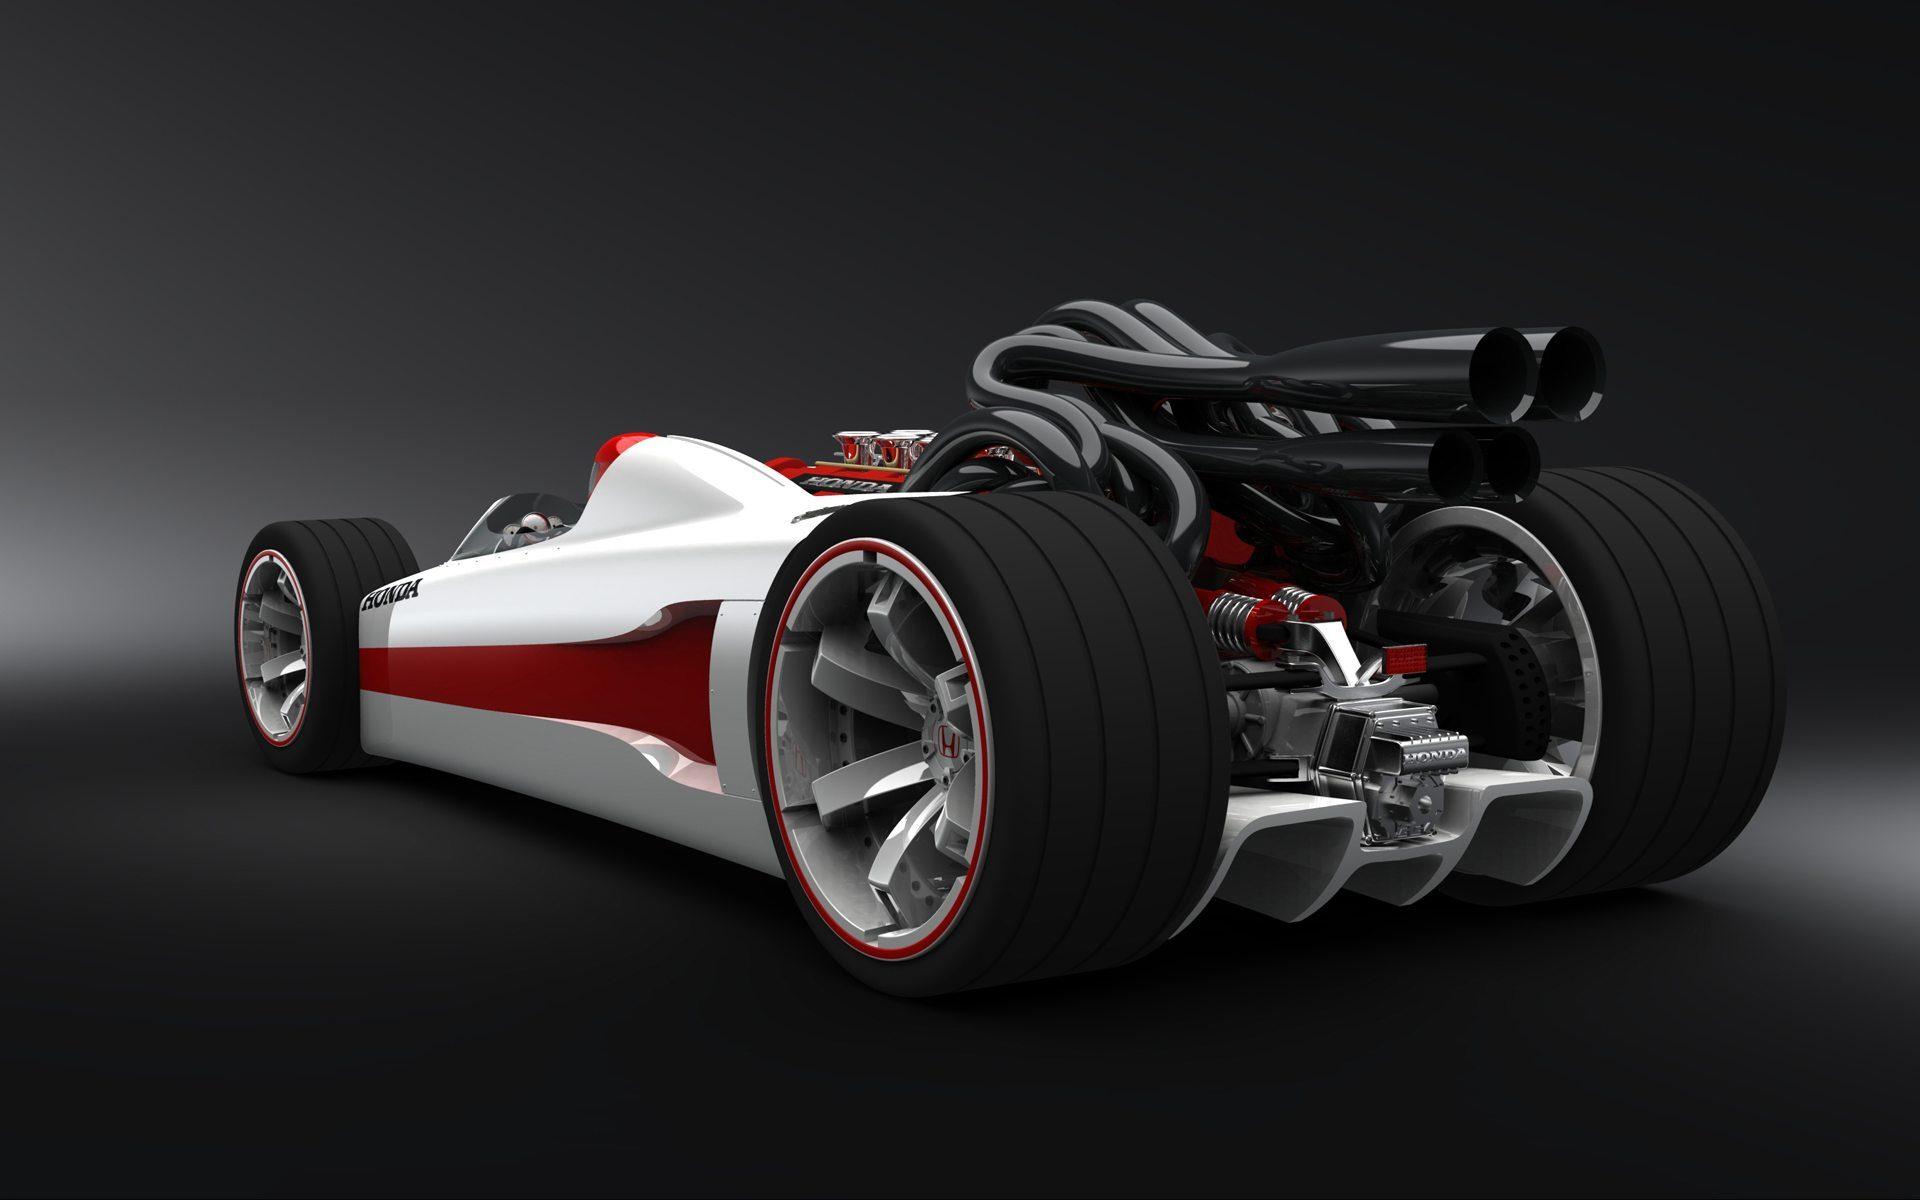 honda-hot-wheels-racer-wallpapers_18021_1920x1200.jpg